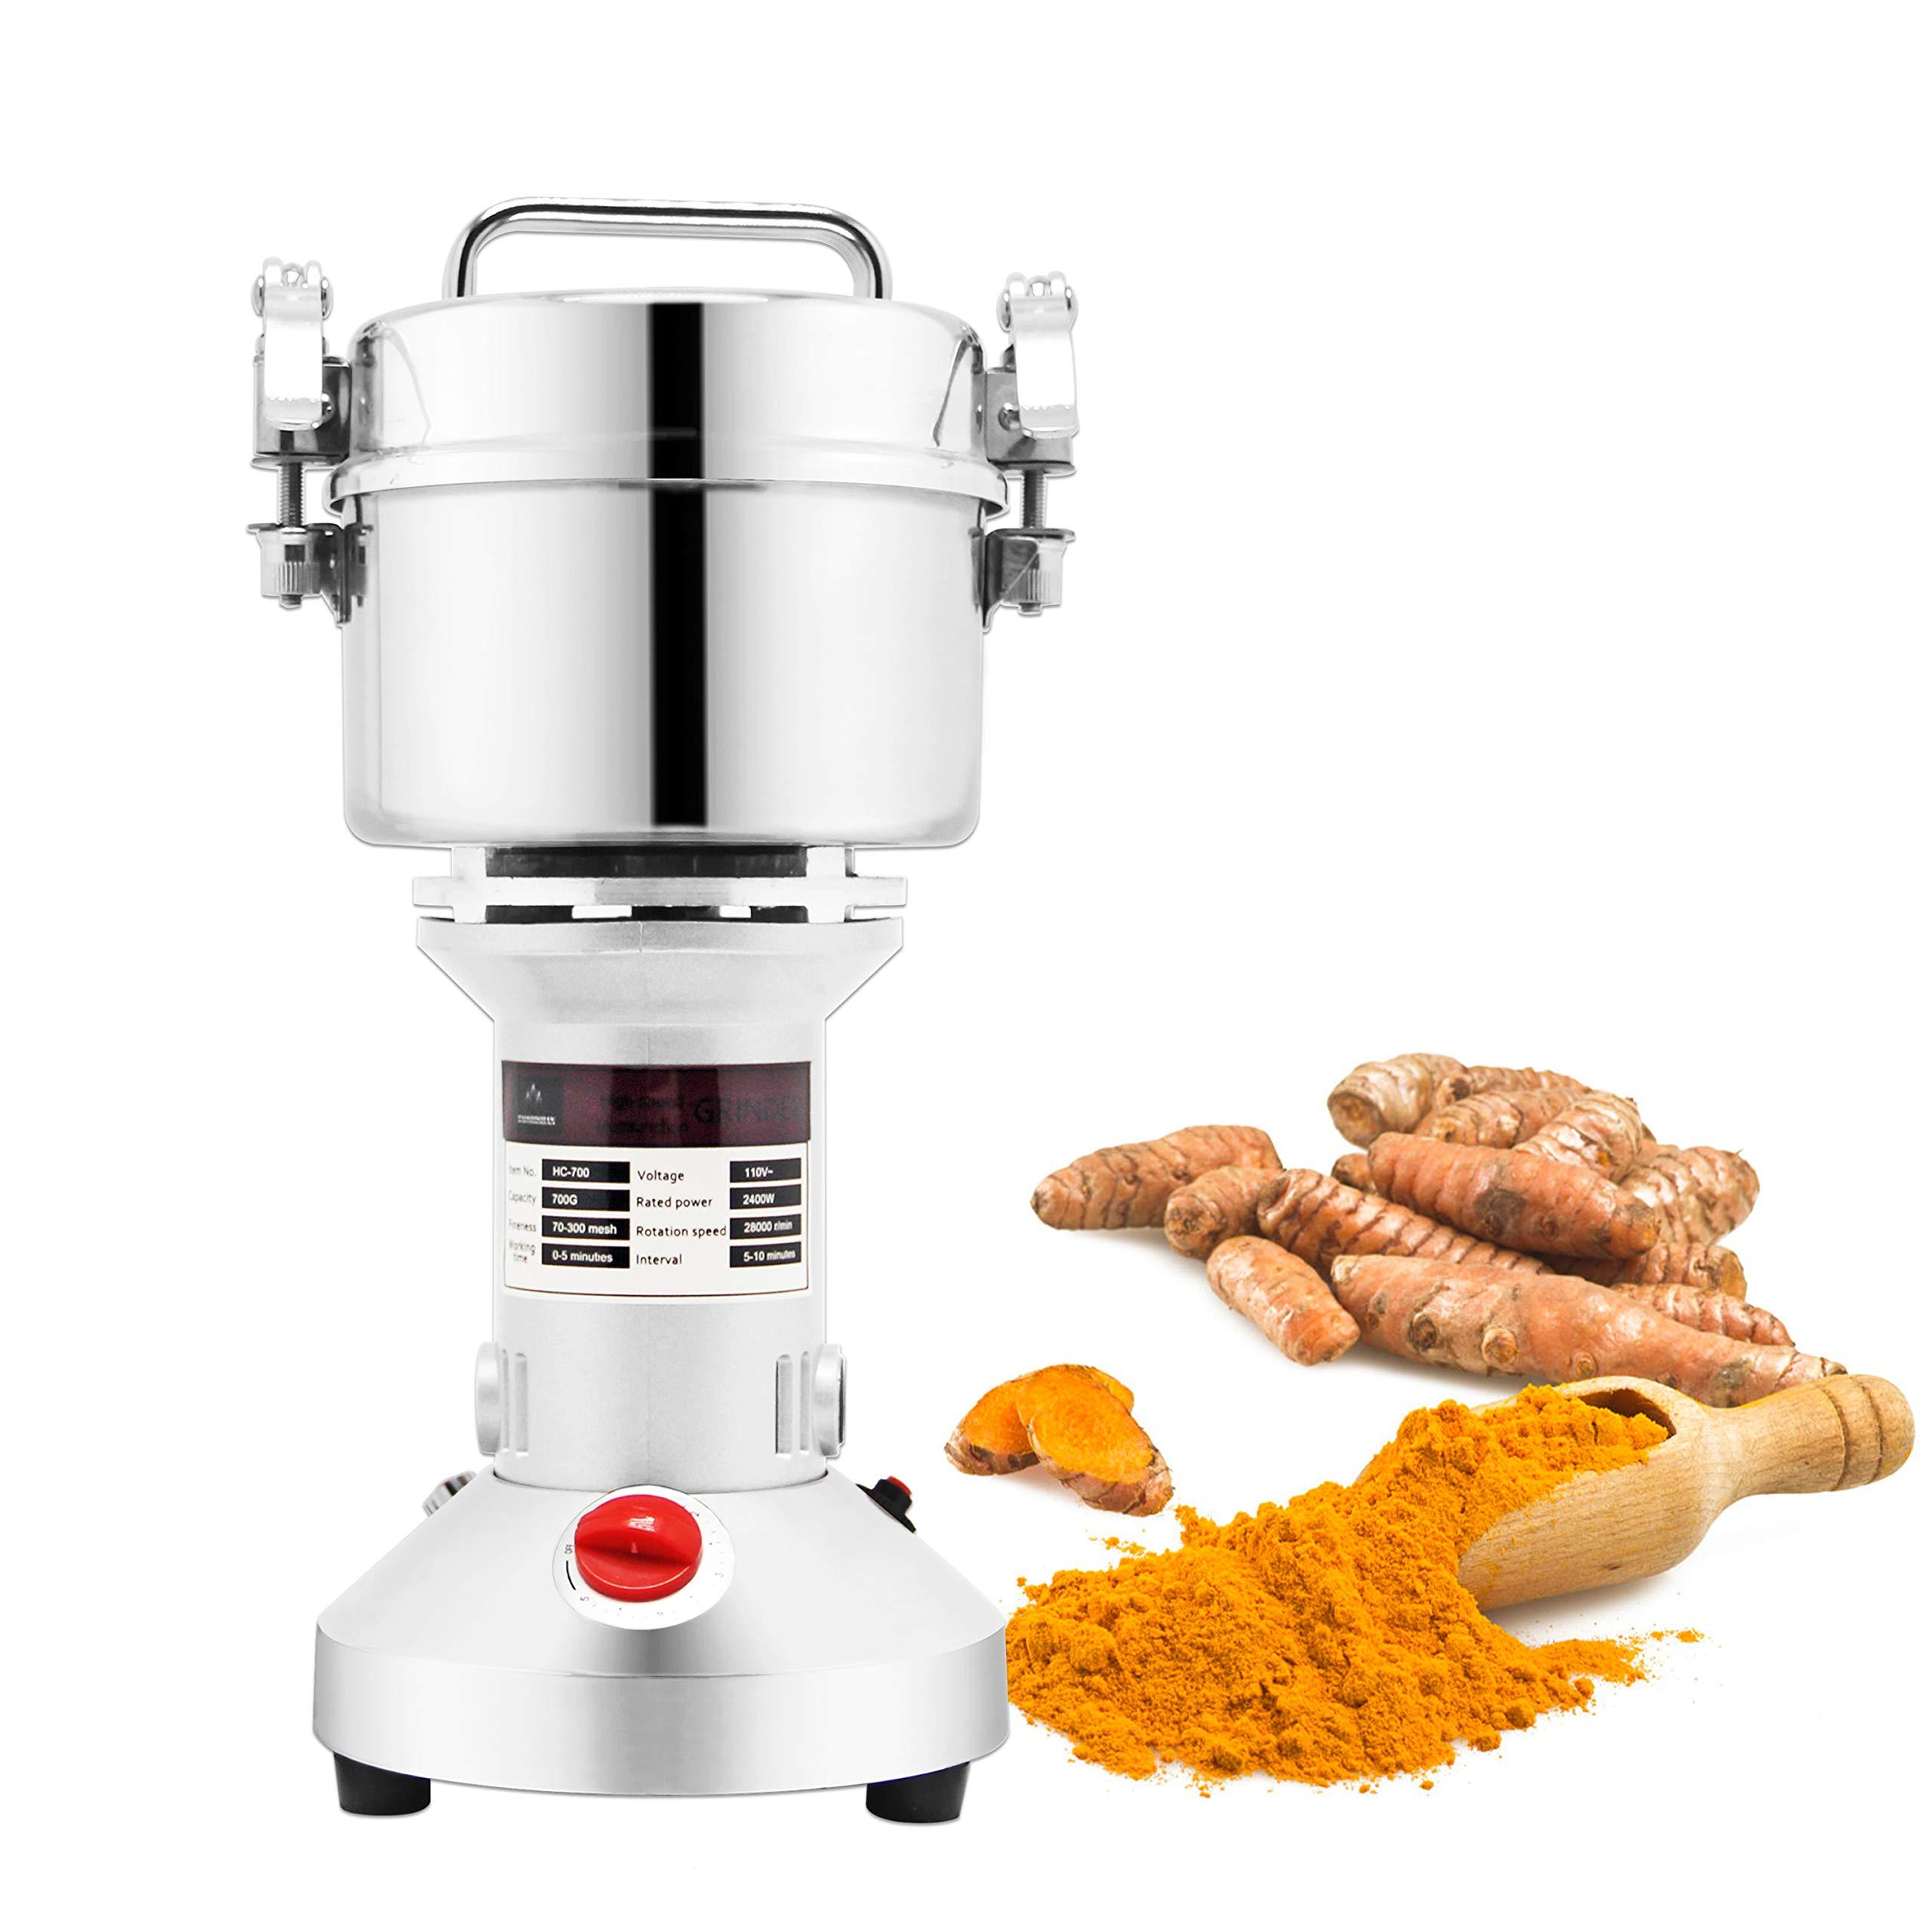 BAOSHISHAN 700g Electric Grain Mill Spice Herb Grinder Coffee Rice Pulverizer Super Fine Powder Machine (110V)